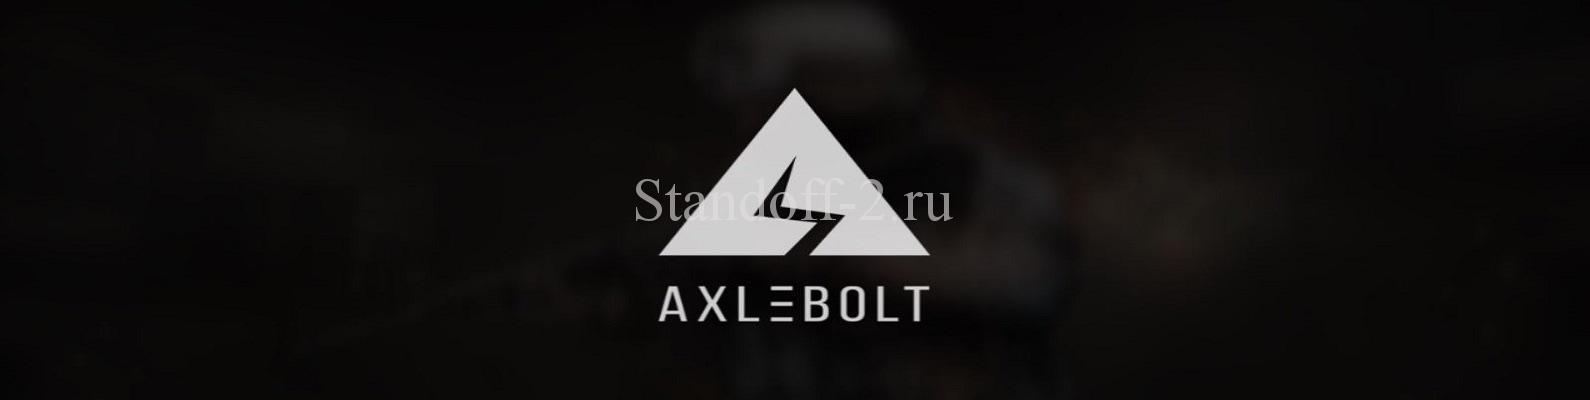 Axlebolt разработчики игра Standoff 2